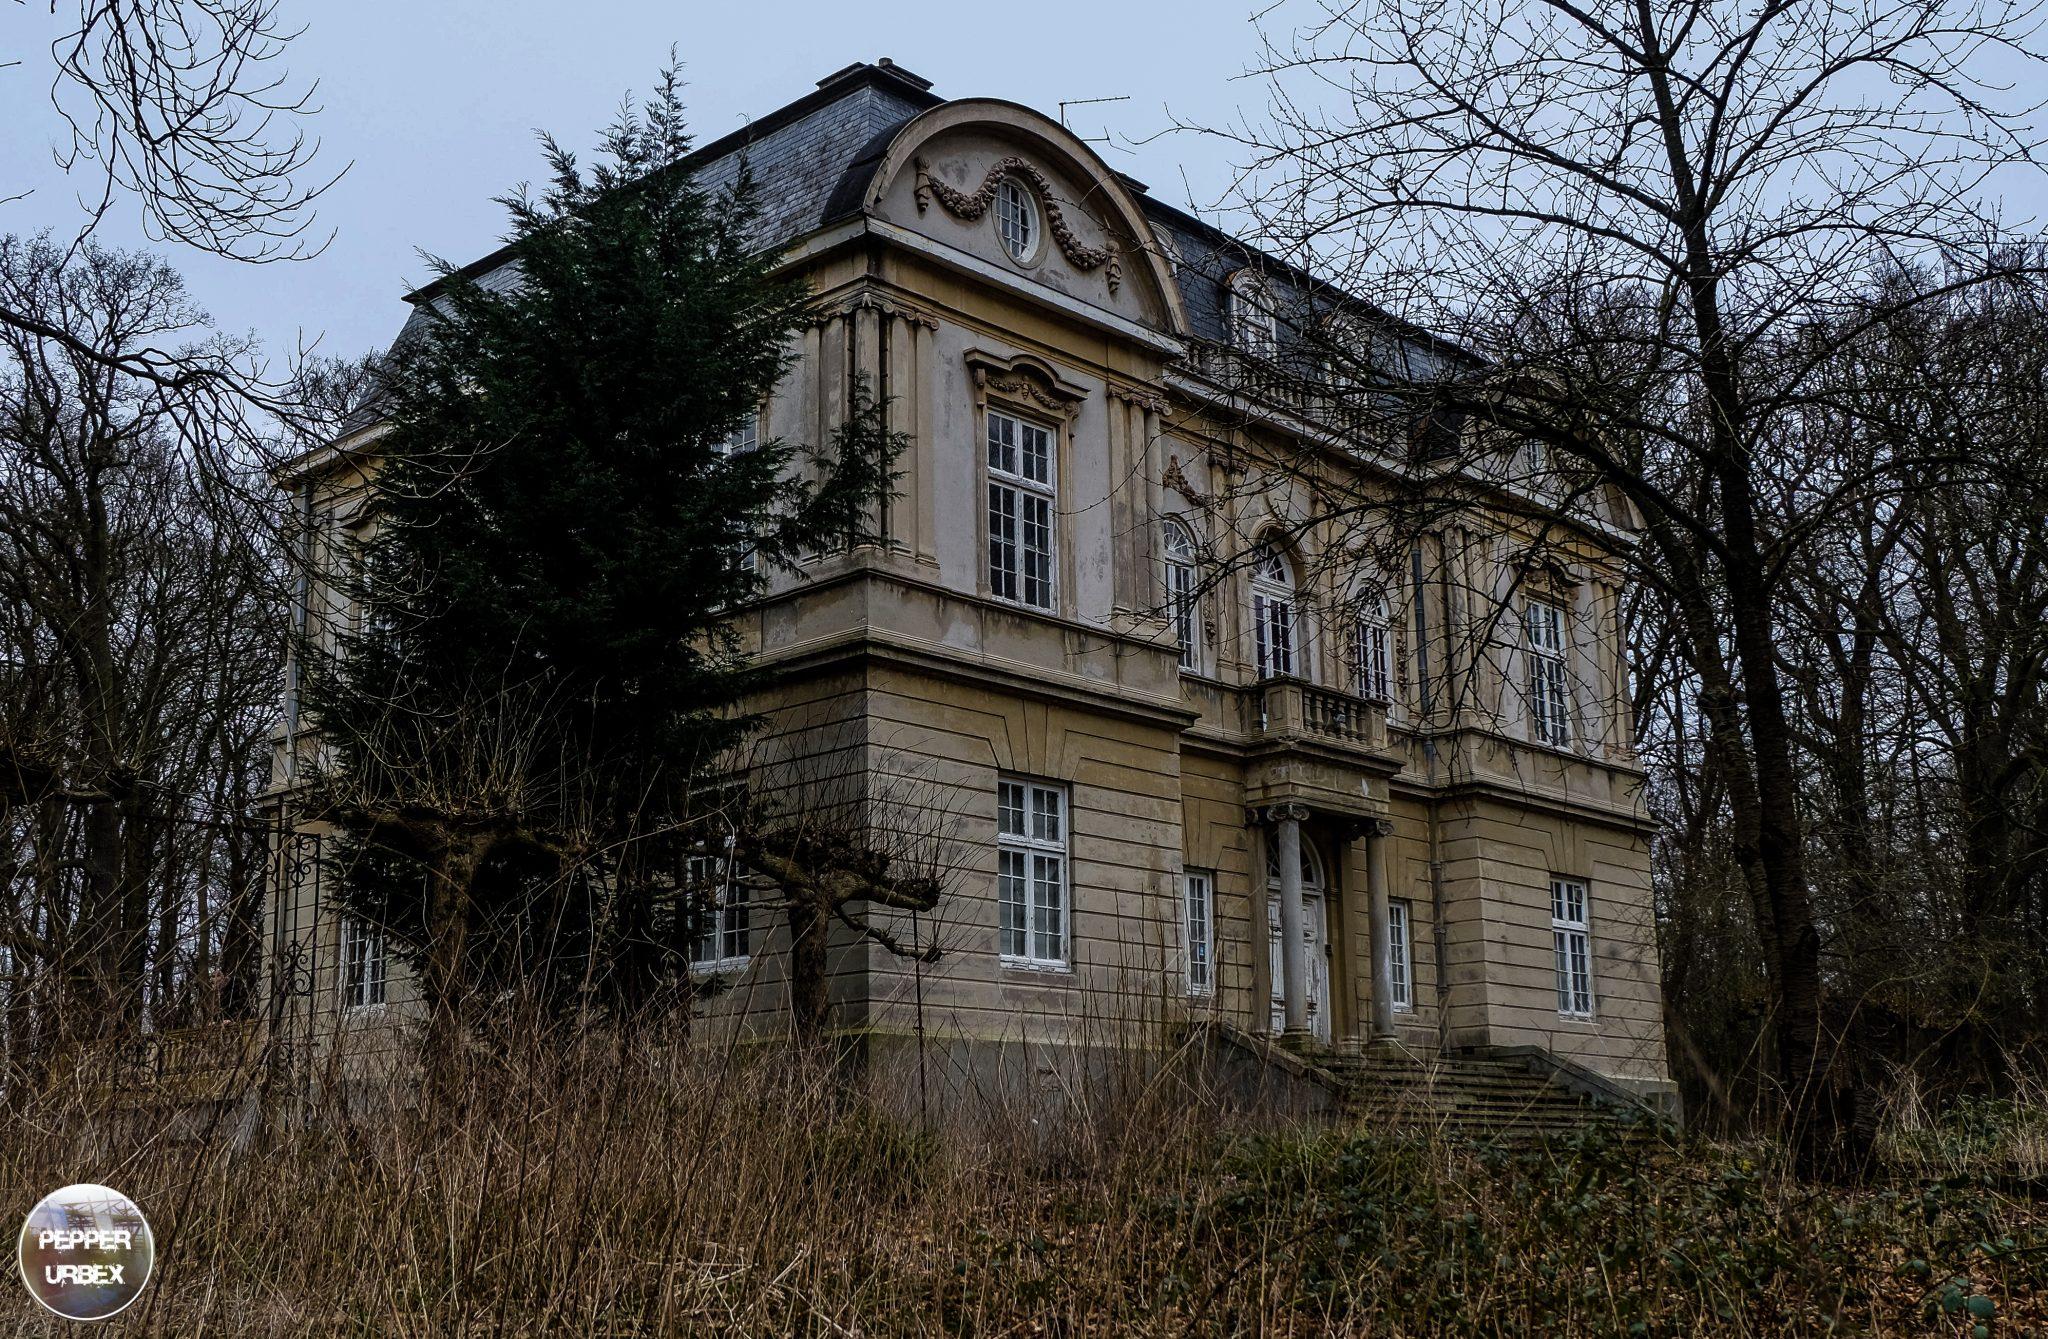 Huize rust en vreugde nl abandoned haunted house for Classic house nl